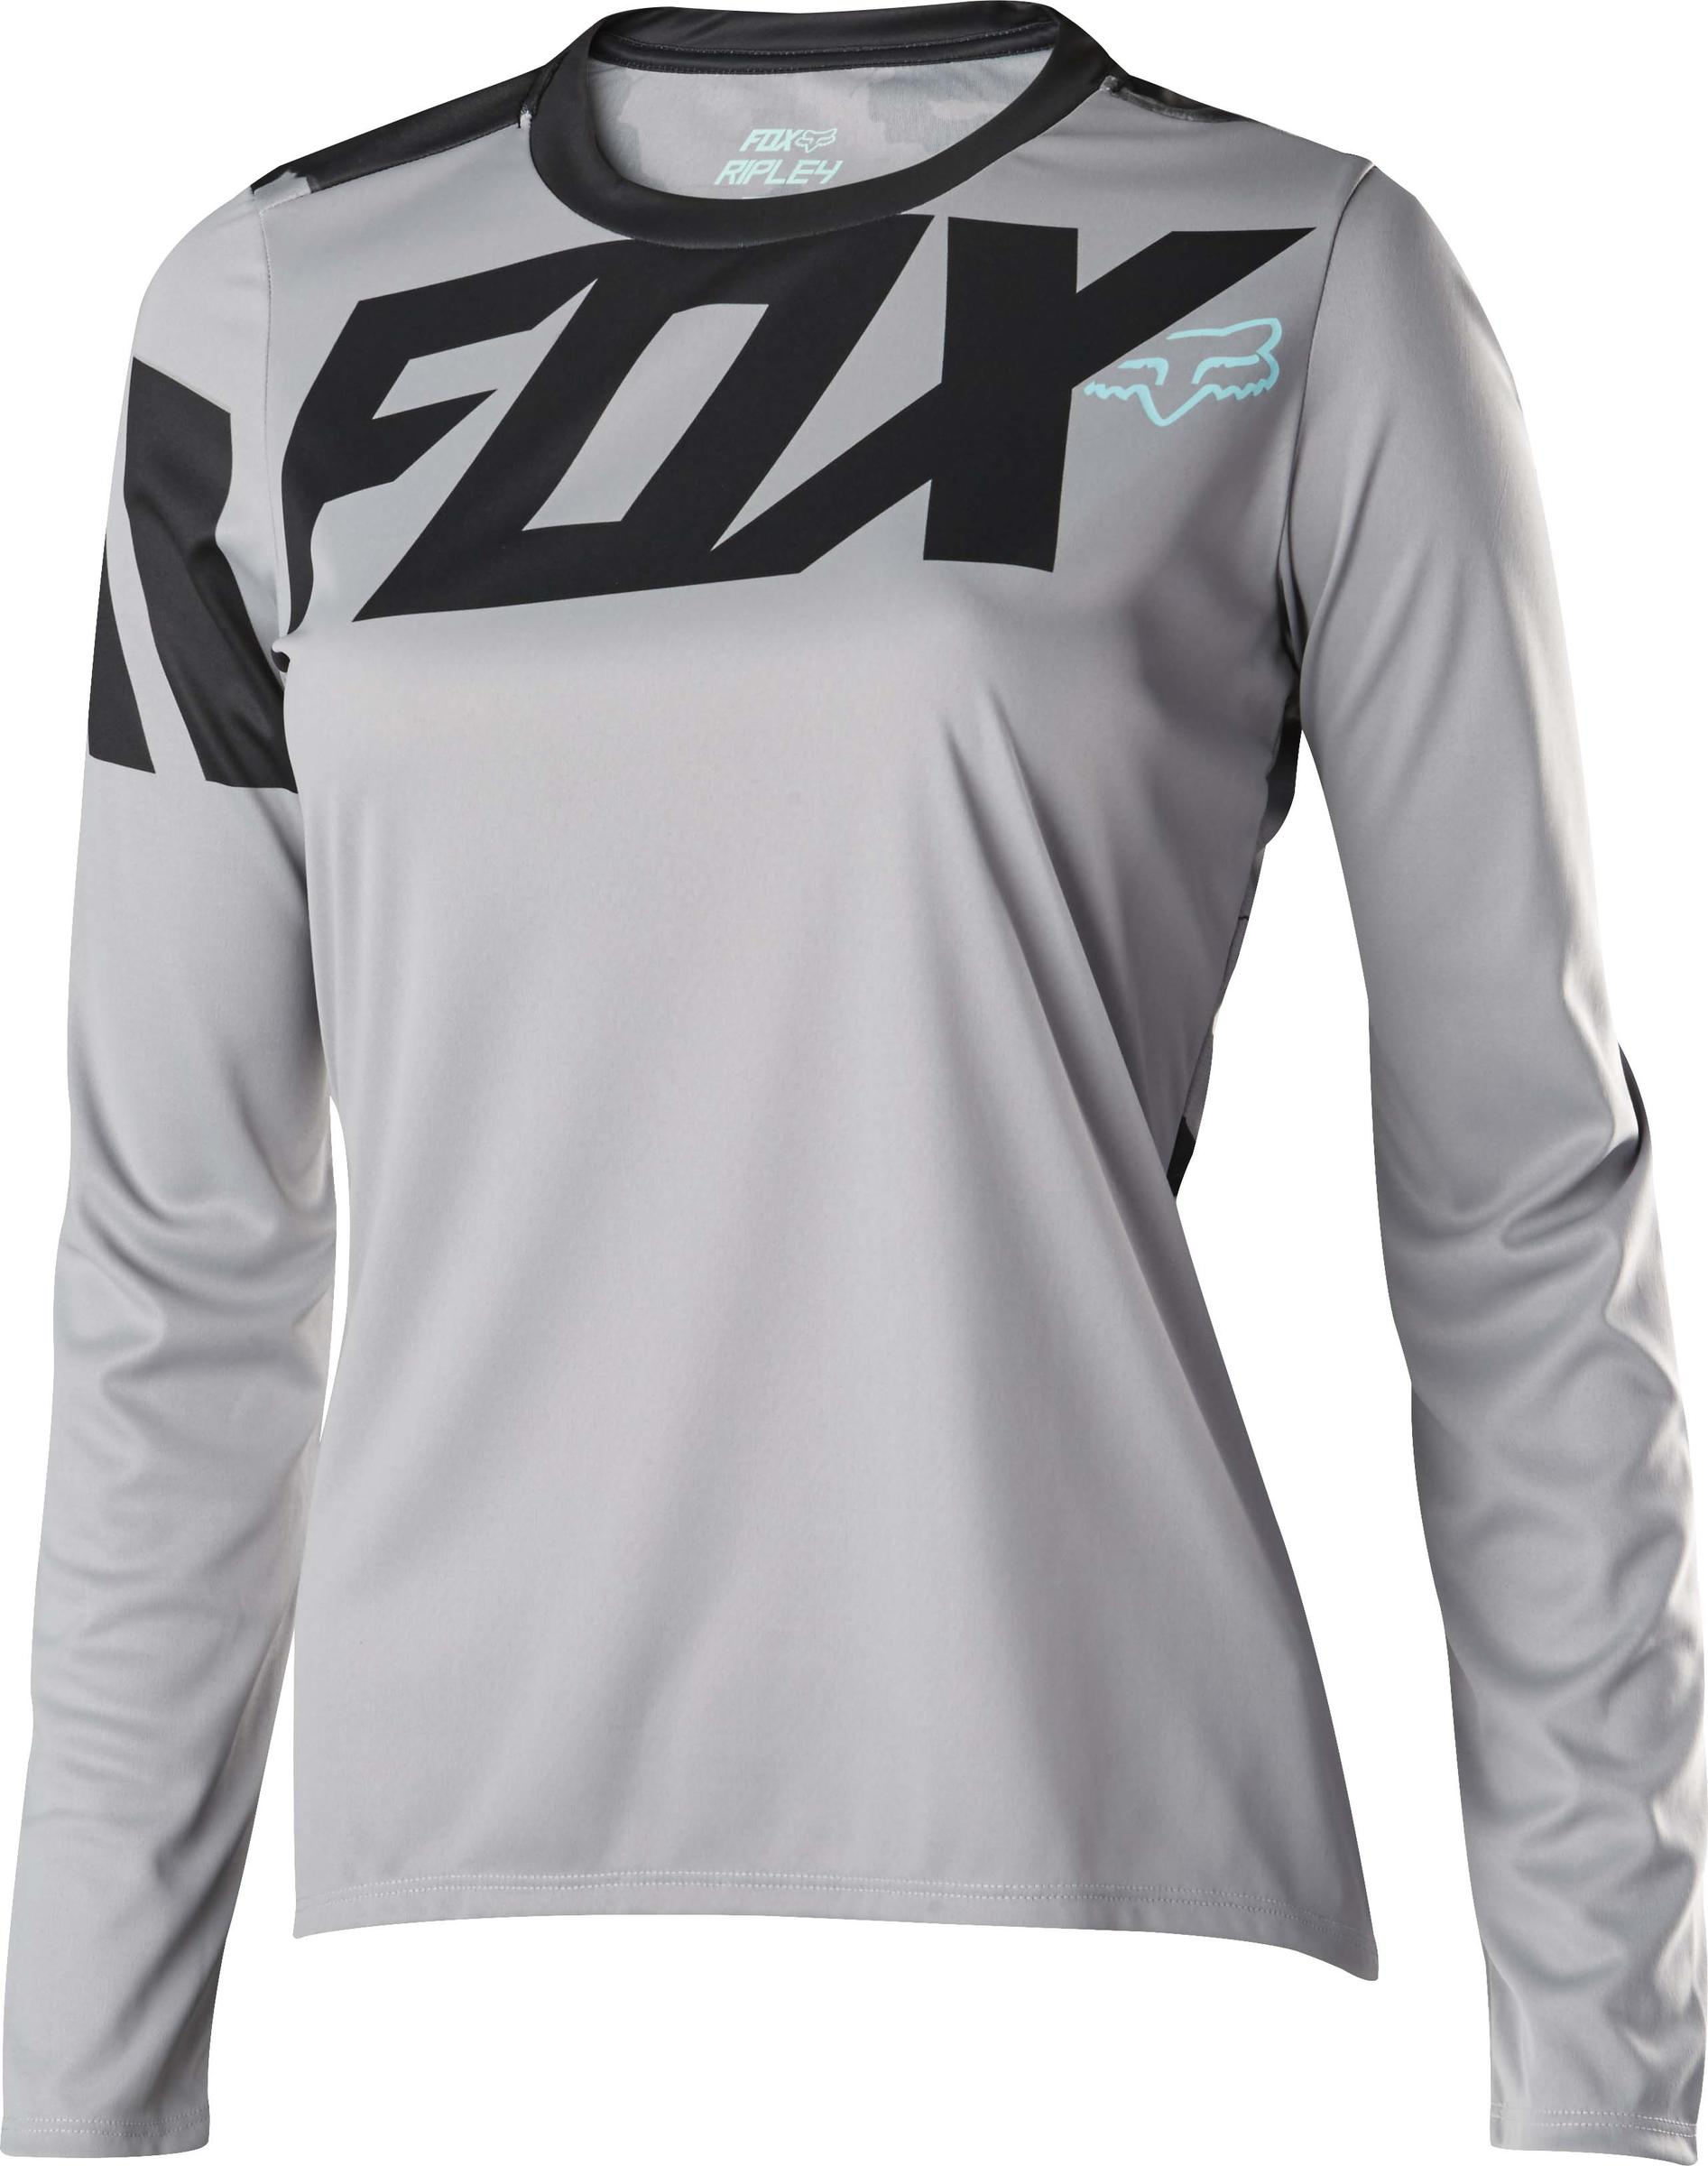 601b24839c2b Fox Racing Women's Ripley Long Sleeve Jersey - www.thebikeshoppe.com